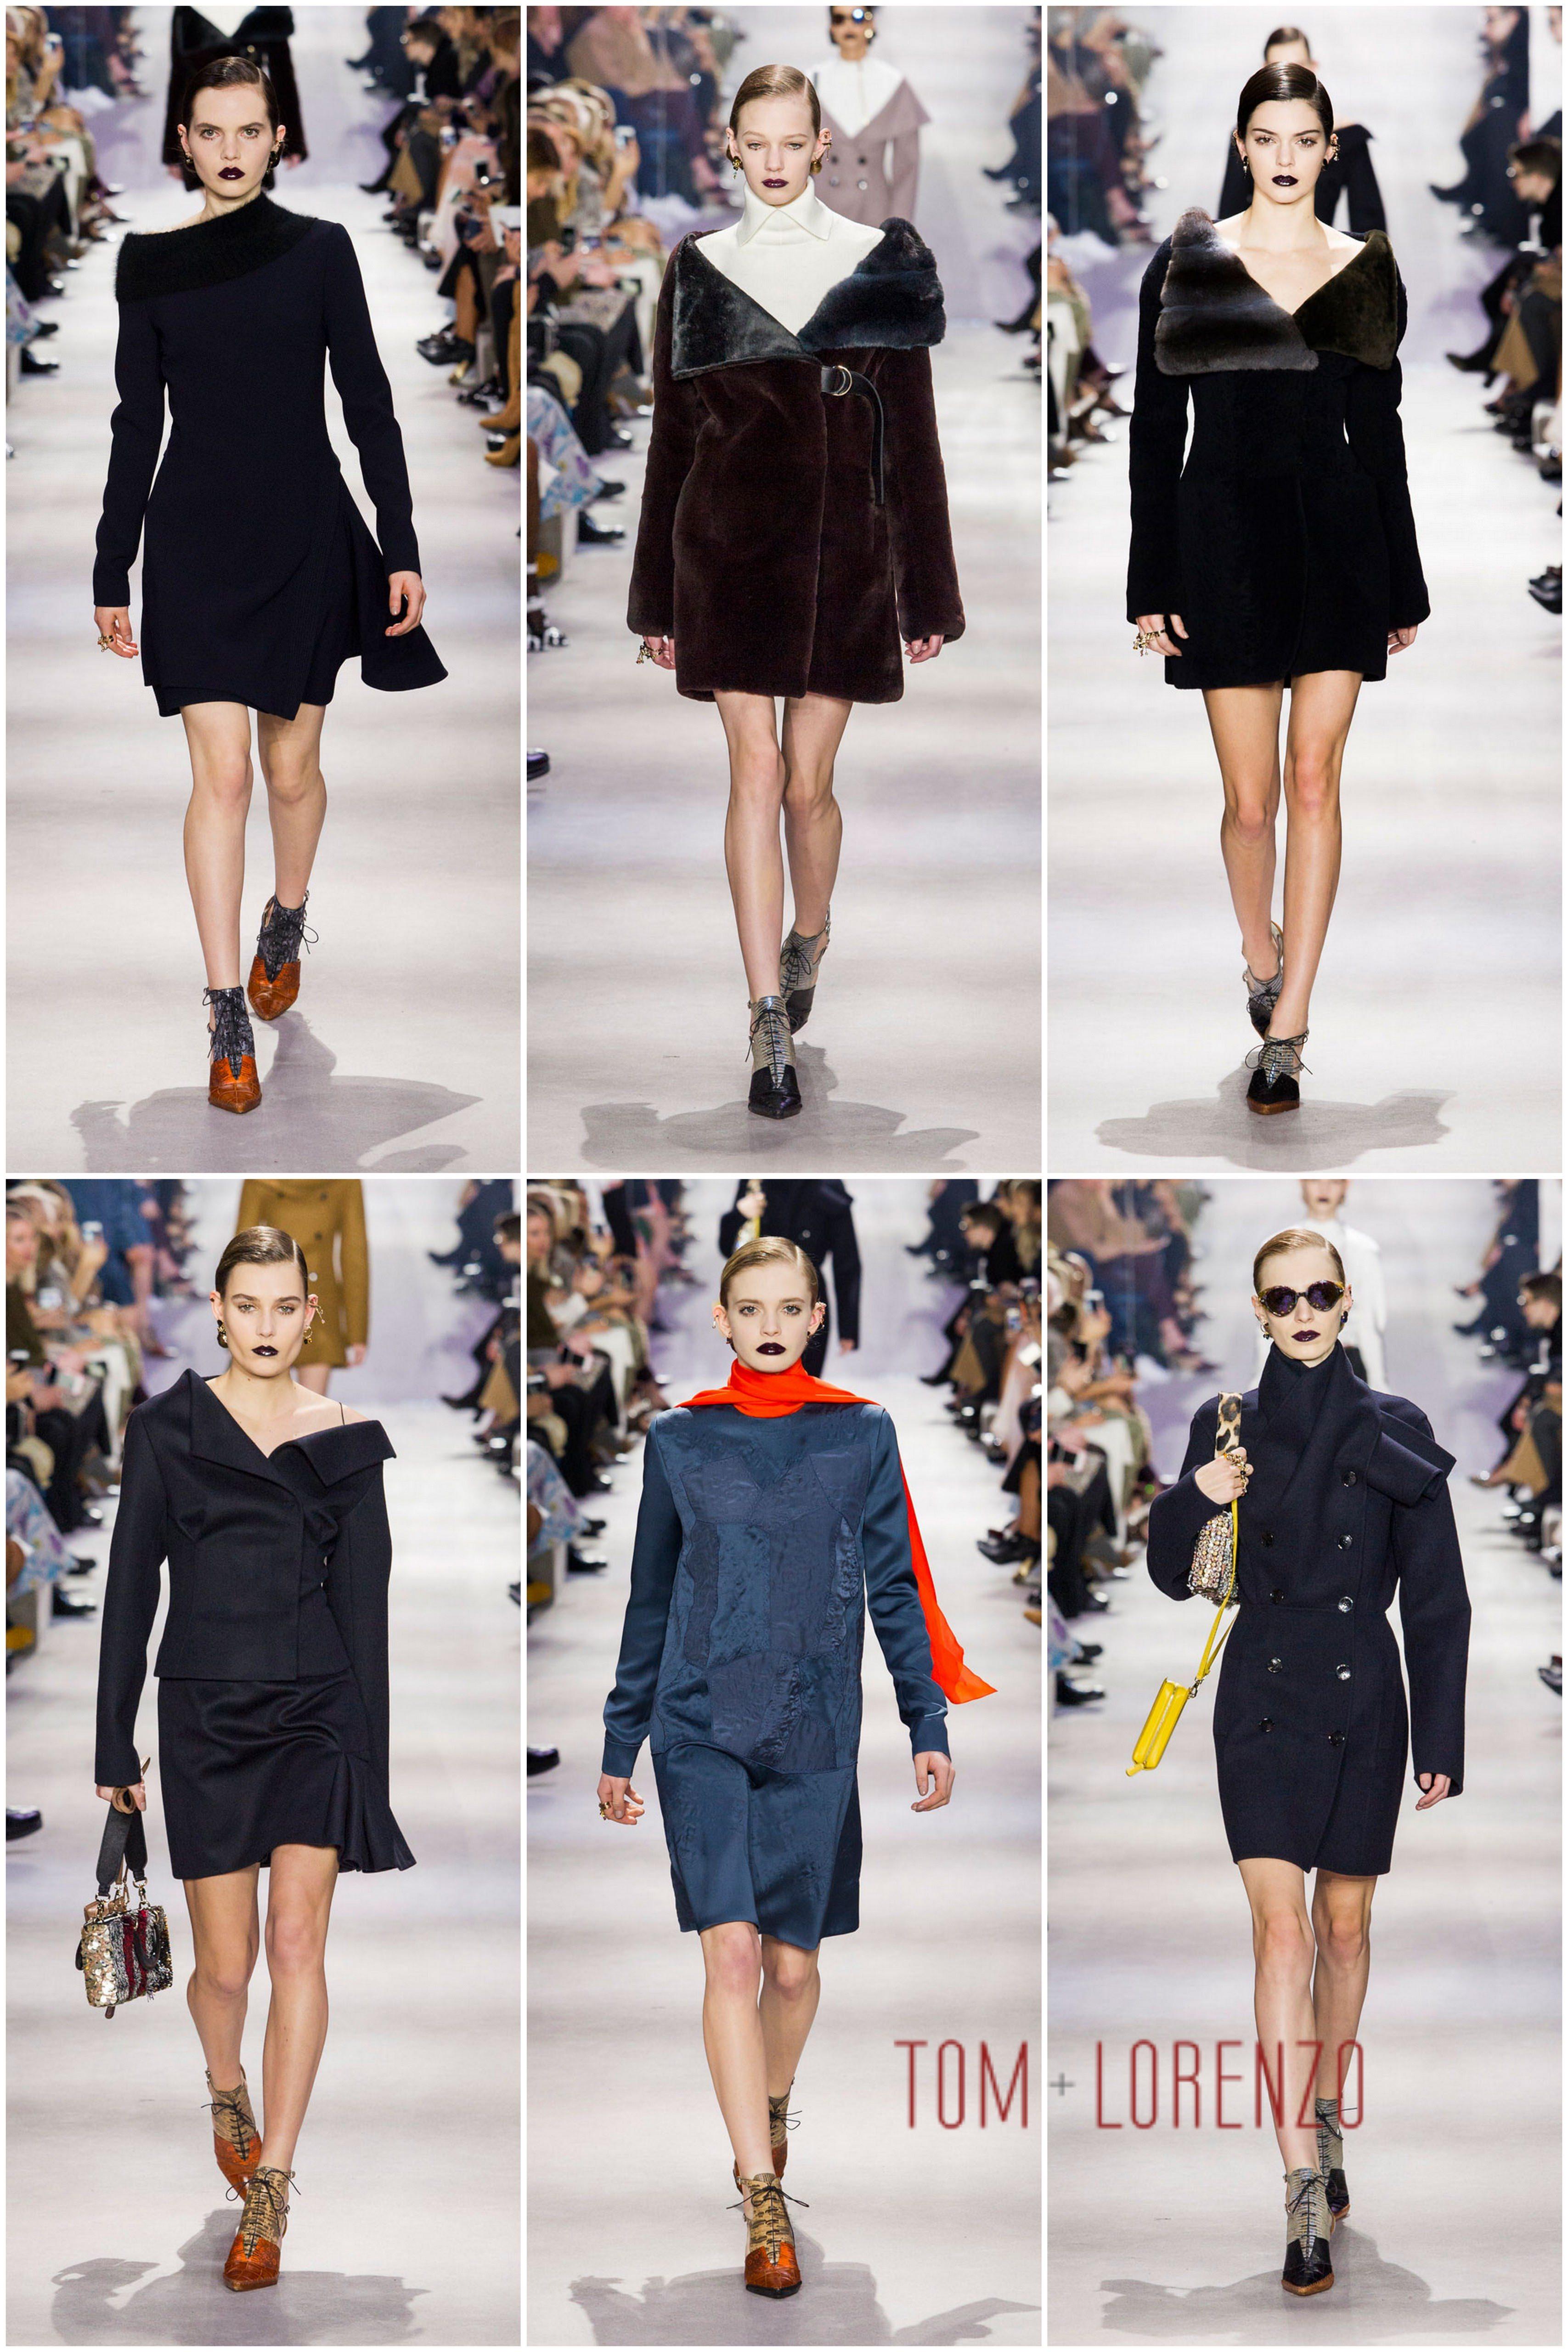 Christian-Dior-Fall-2016-Collection-Paris-Fashion-Week-Tom-Lorenzo-Site (8)